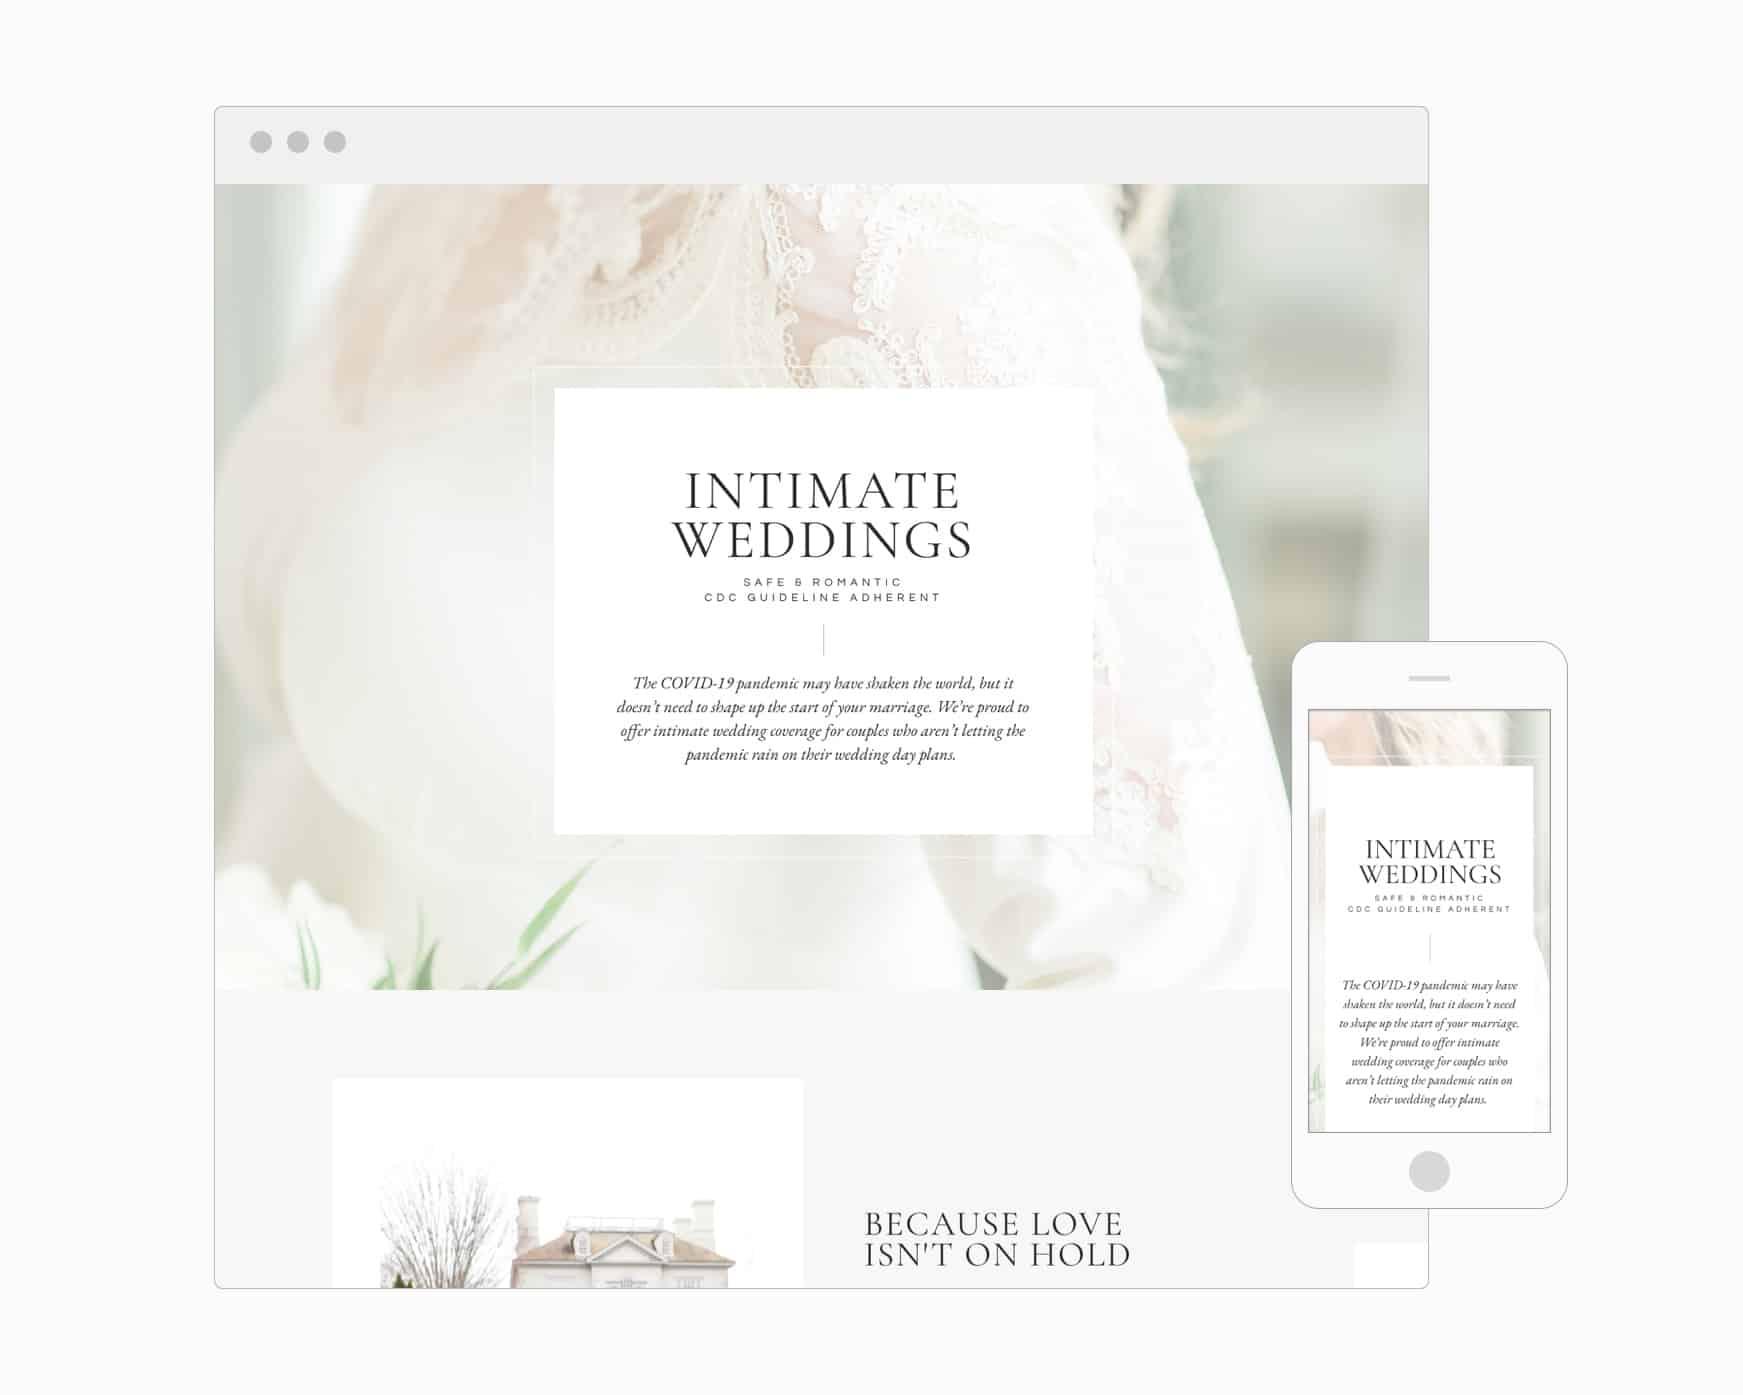 Intimate Weddings Page (WordPress)